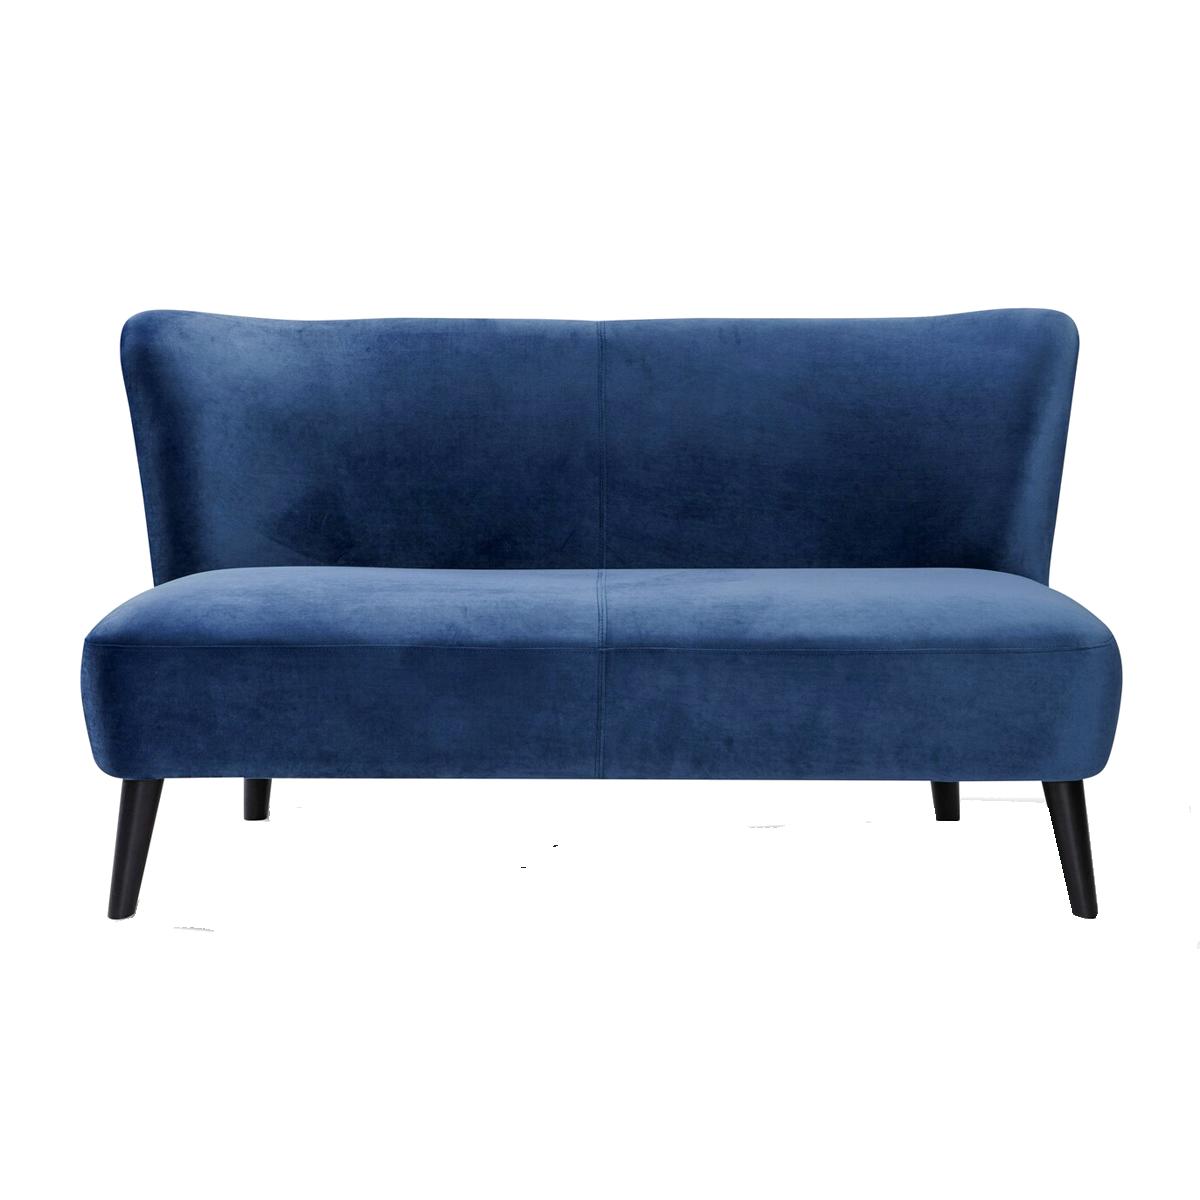 Full Size of Sofa L Form Online Kaufen Comfortmaster U überzug Bett 200x180 3 Sitzer 2 Mit Schlaffunktion Natura Bora Stoff Grau 140x200 Relaxfunktion Dreisitzer Sofa 2 Sitzer Sofa